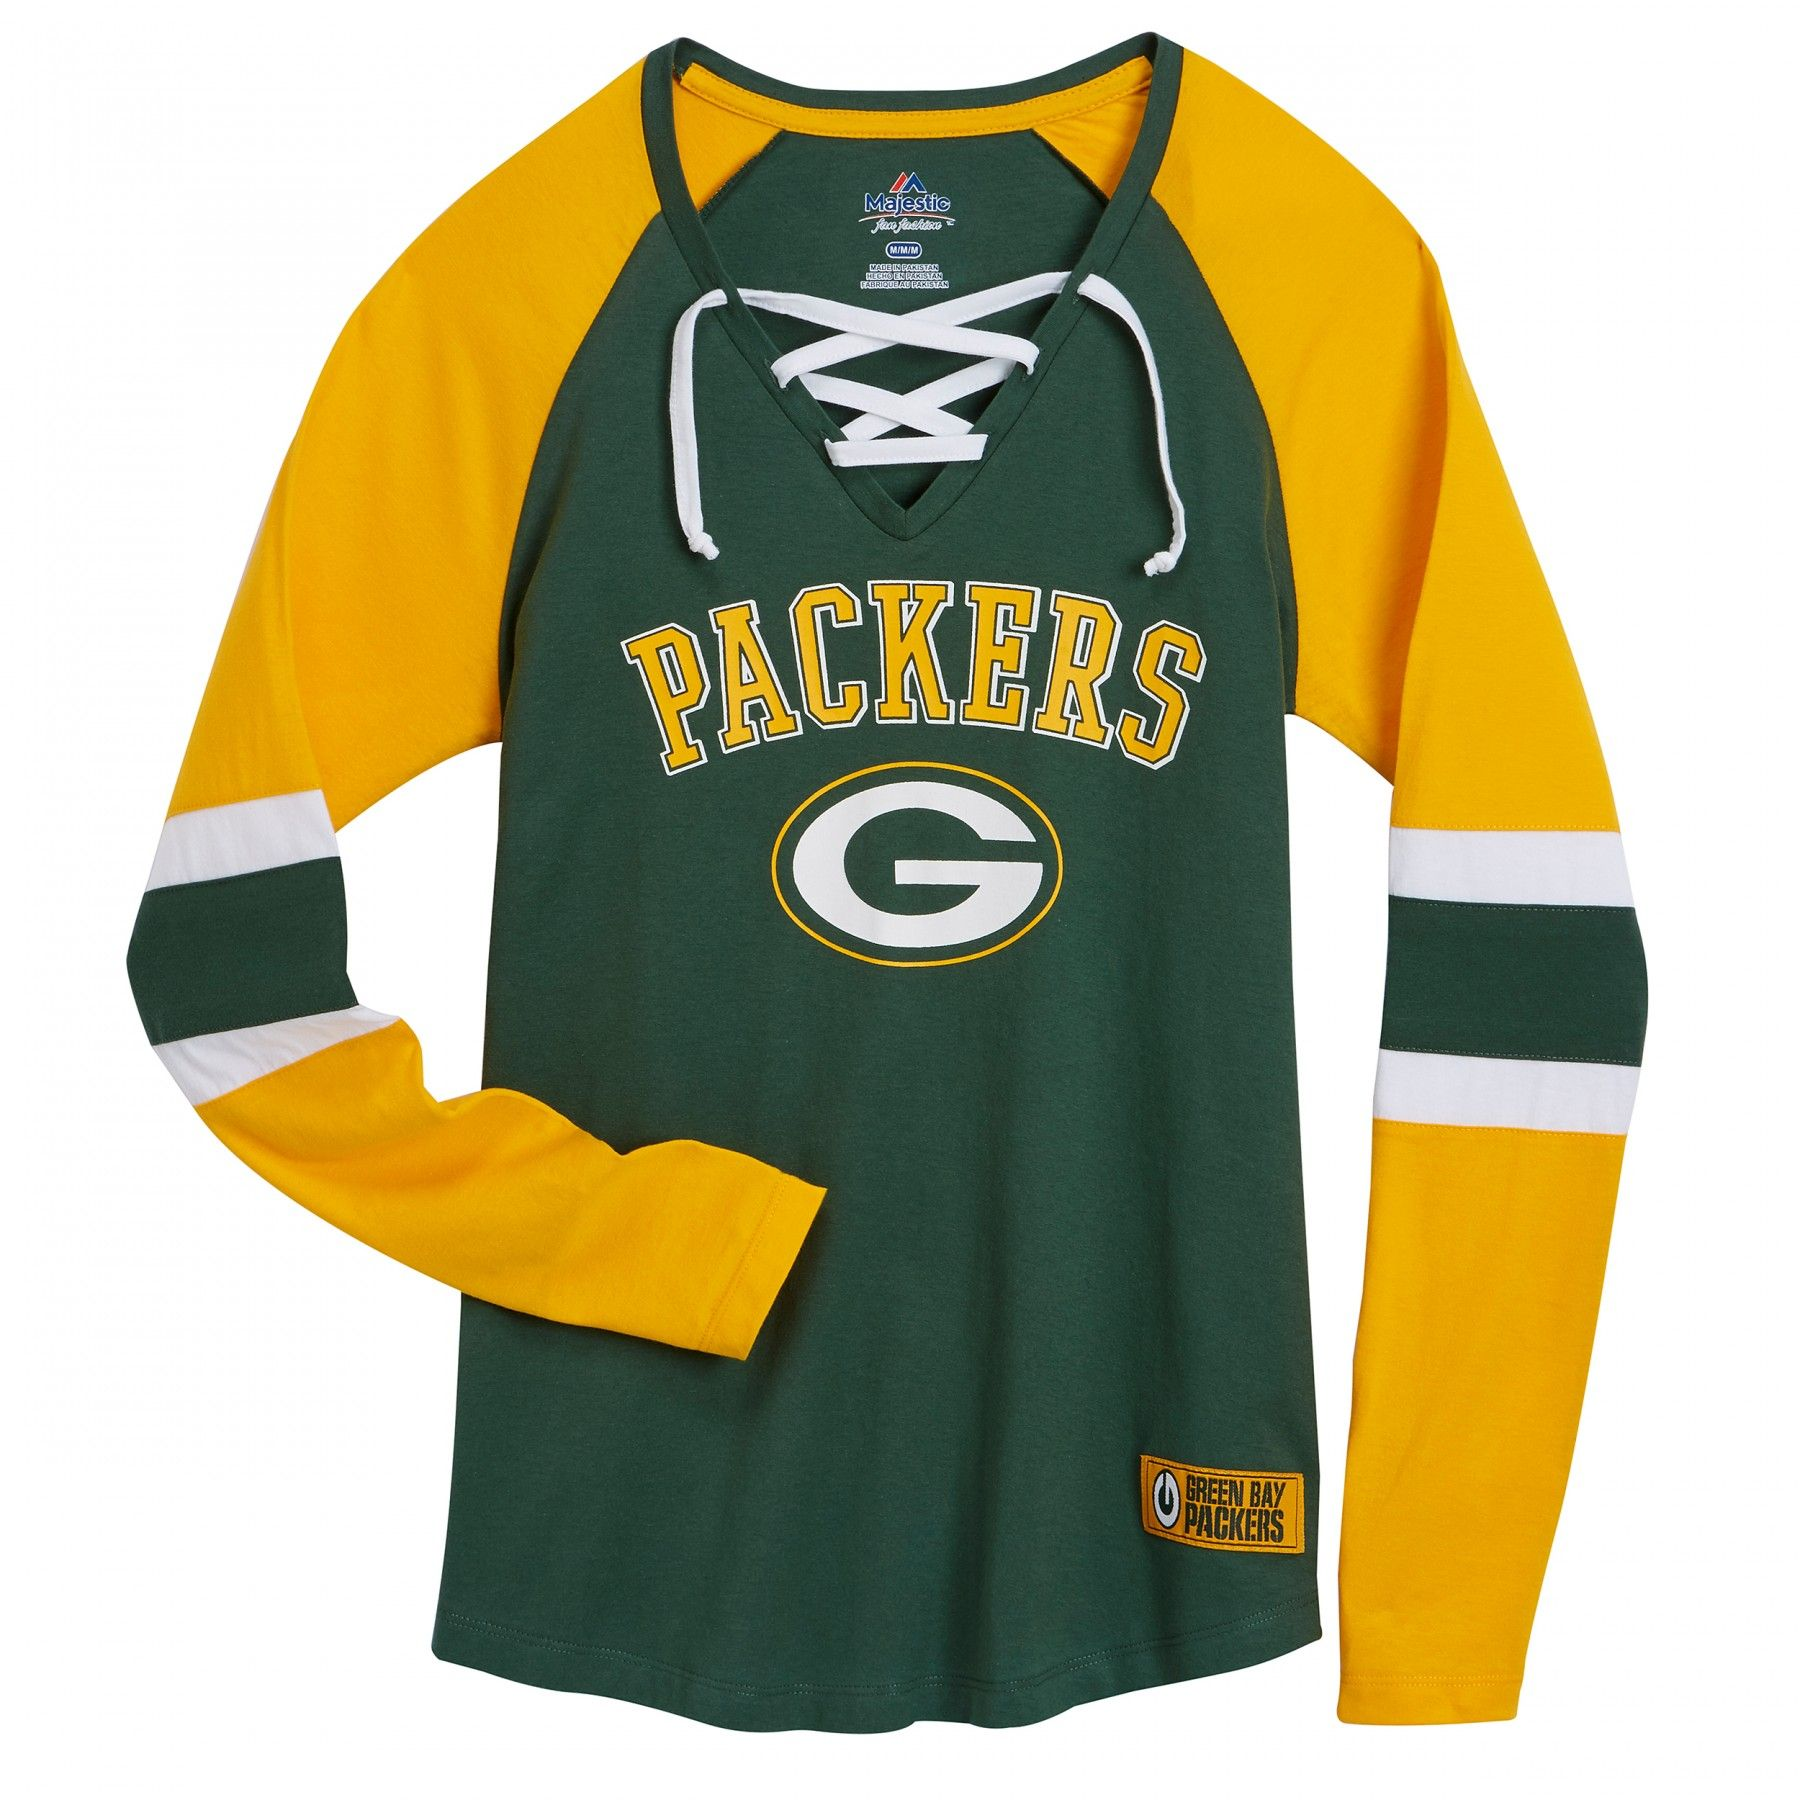 Green Bay Packers Women S Winning Style T Shirt At The Packers Pro Shop Packers Womens Green Bay Packers Shirts